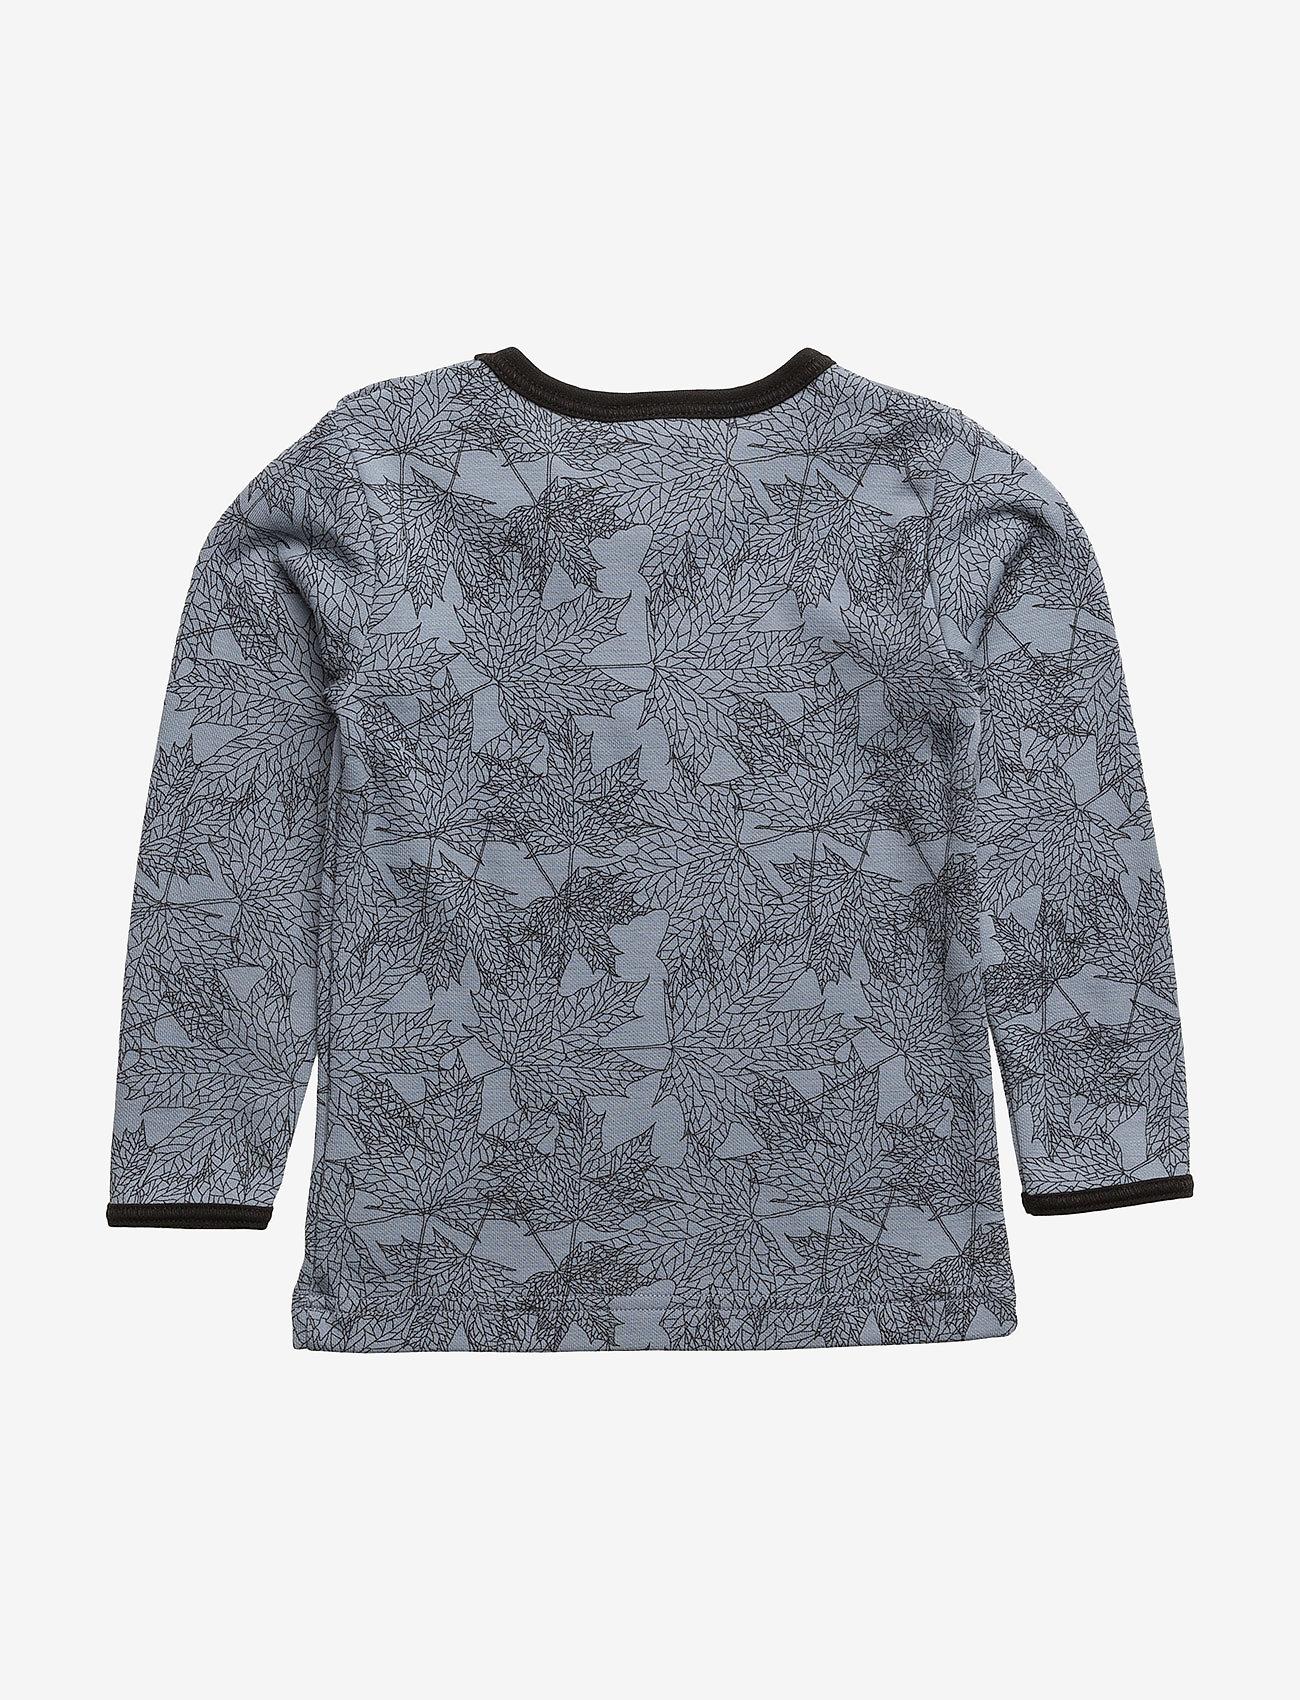 Petit by Sofie Schnoor - T-shirt - langærmede t-shirts - mist - 1